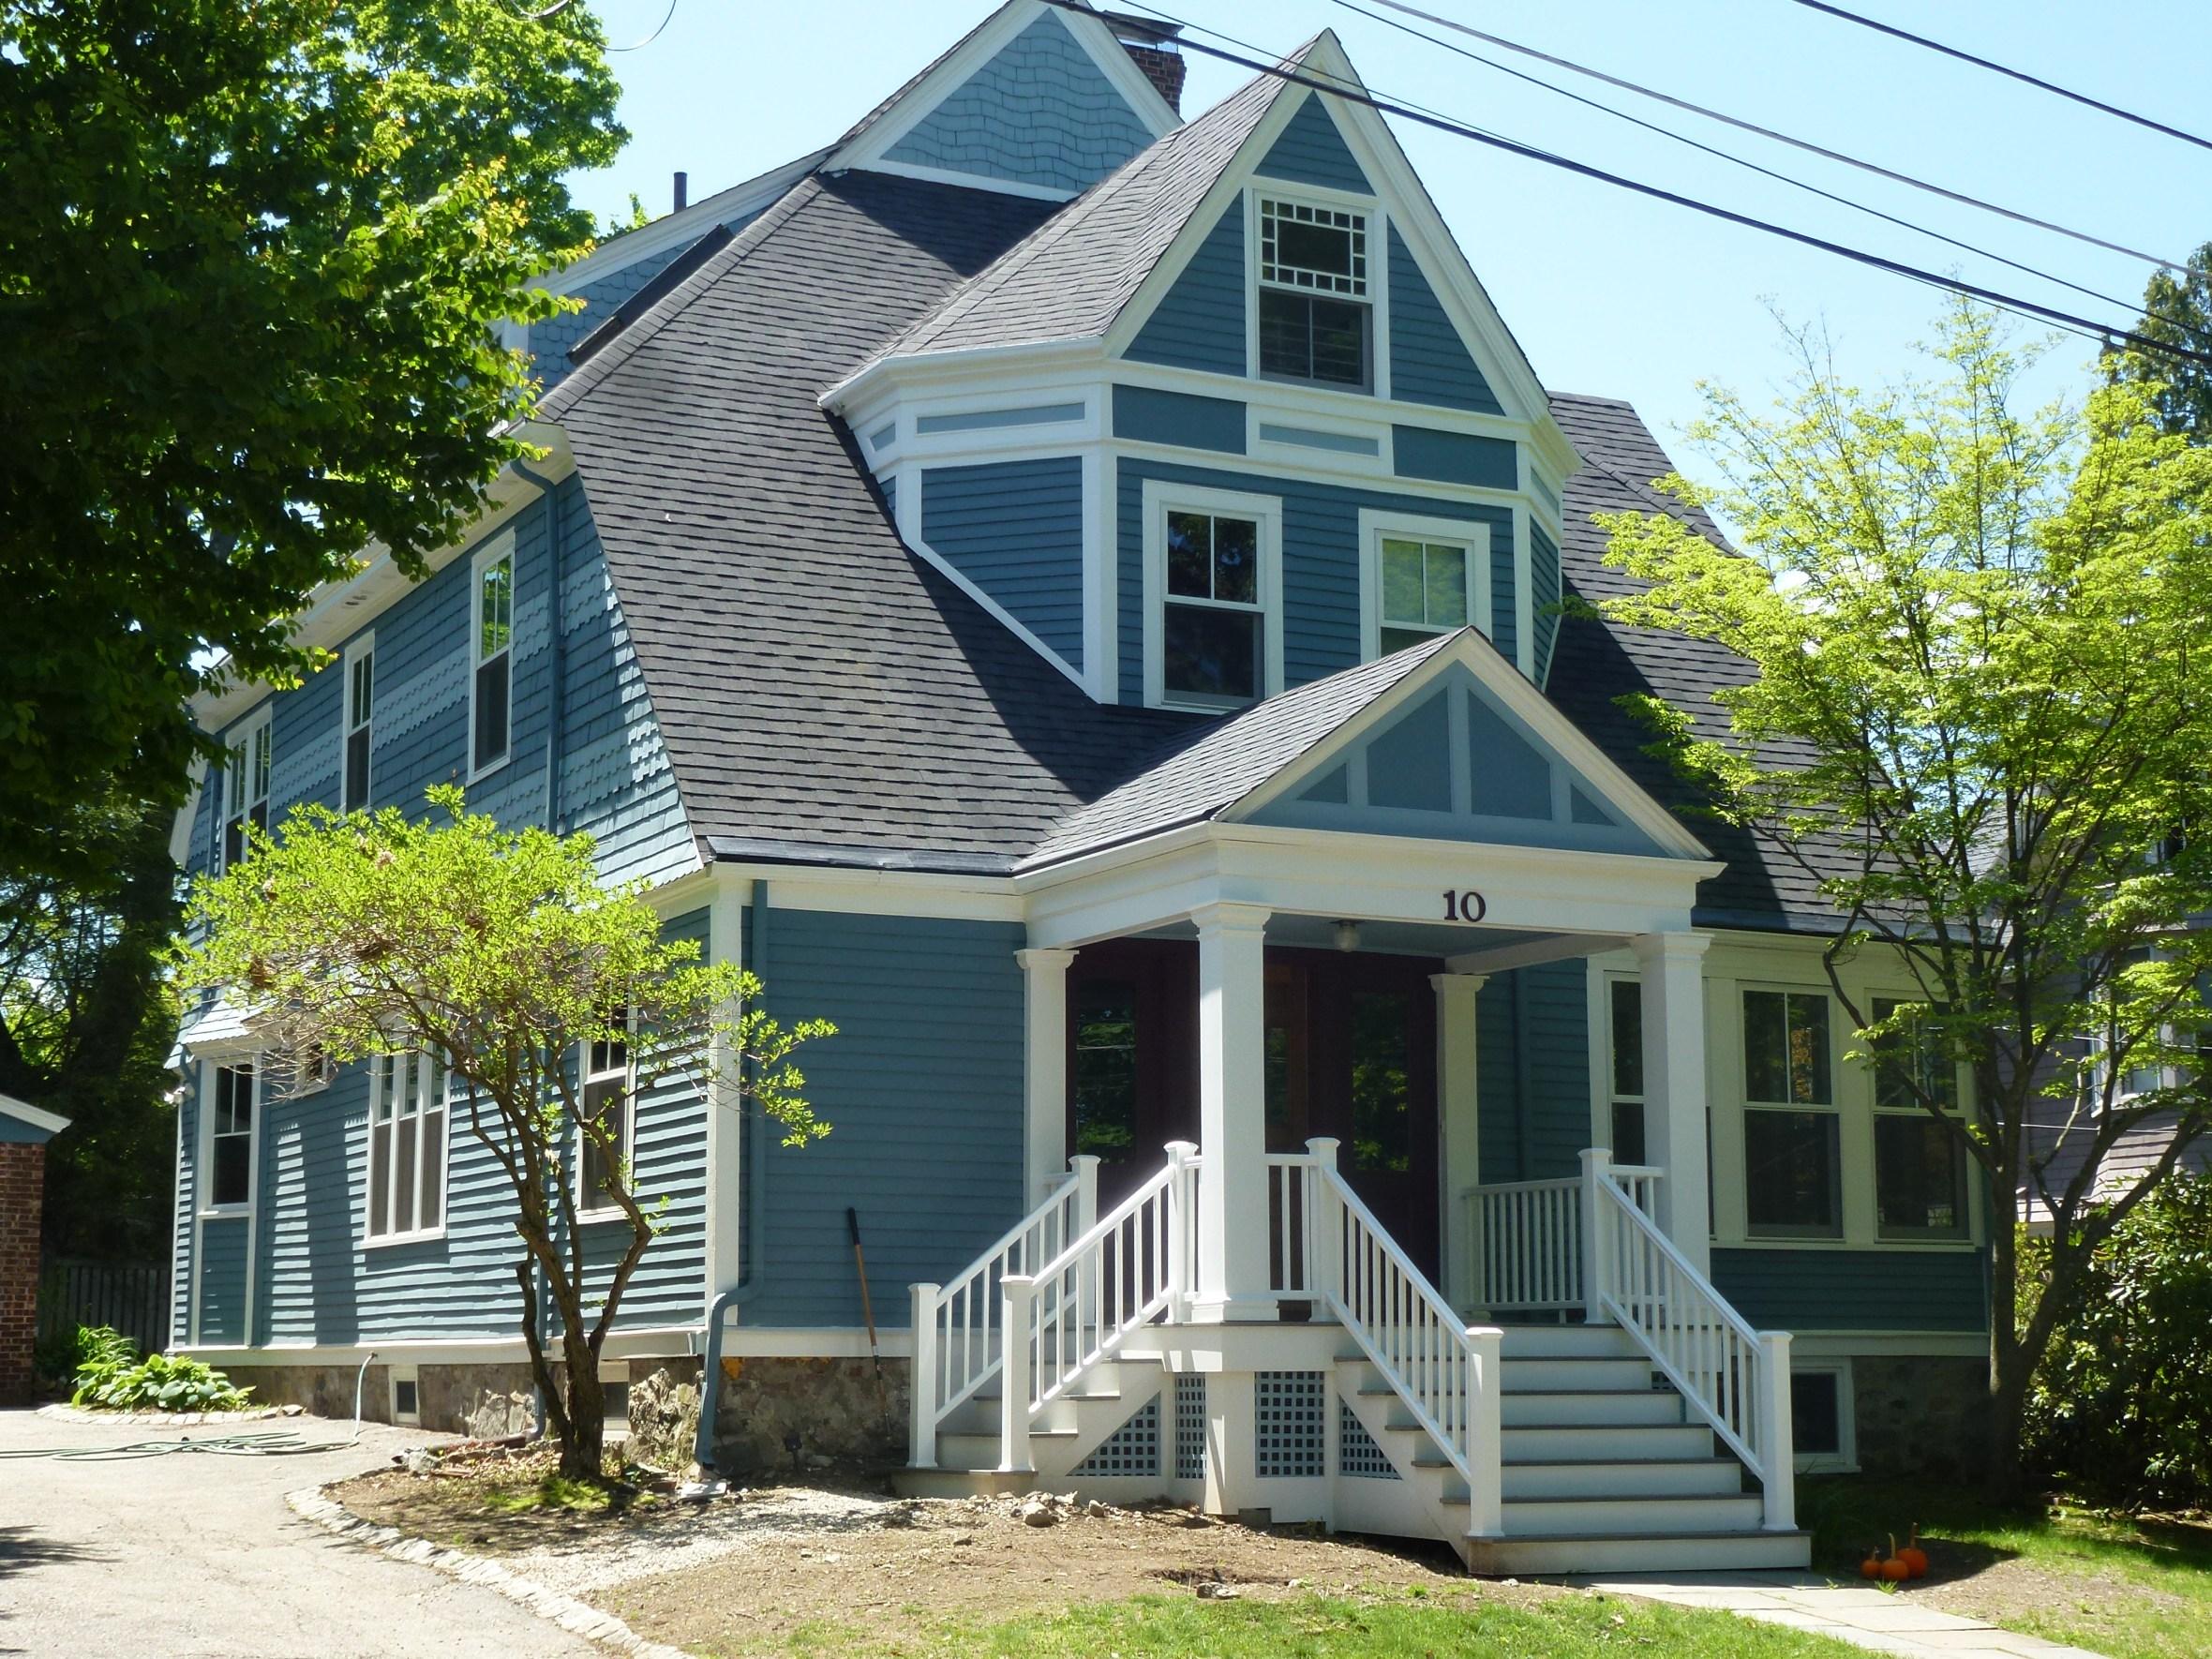 Color design - Victorian exterior - blue